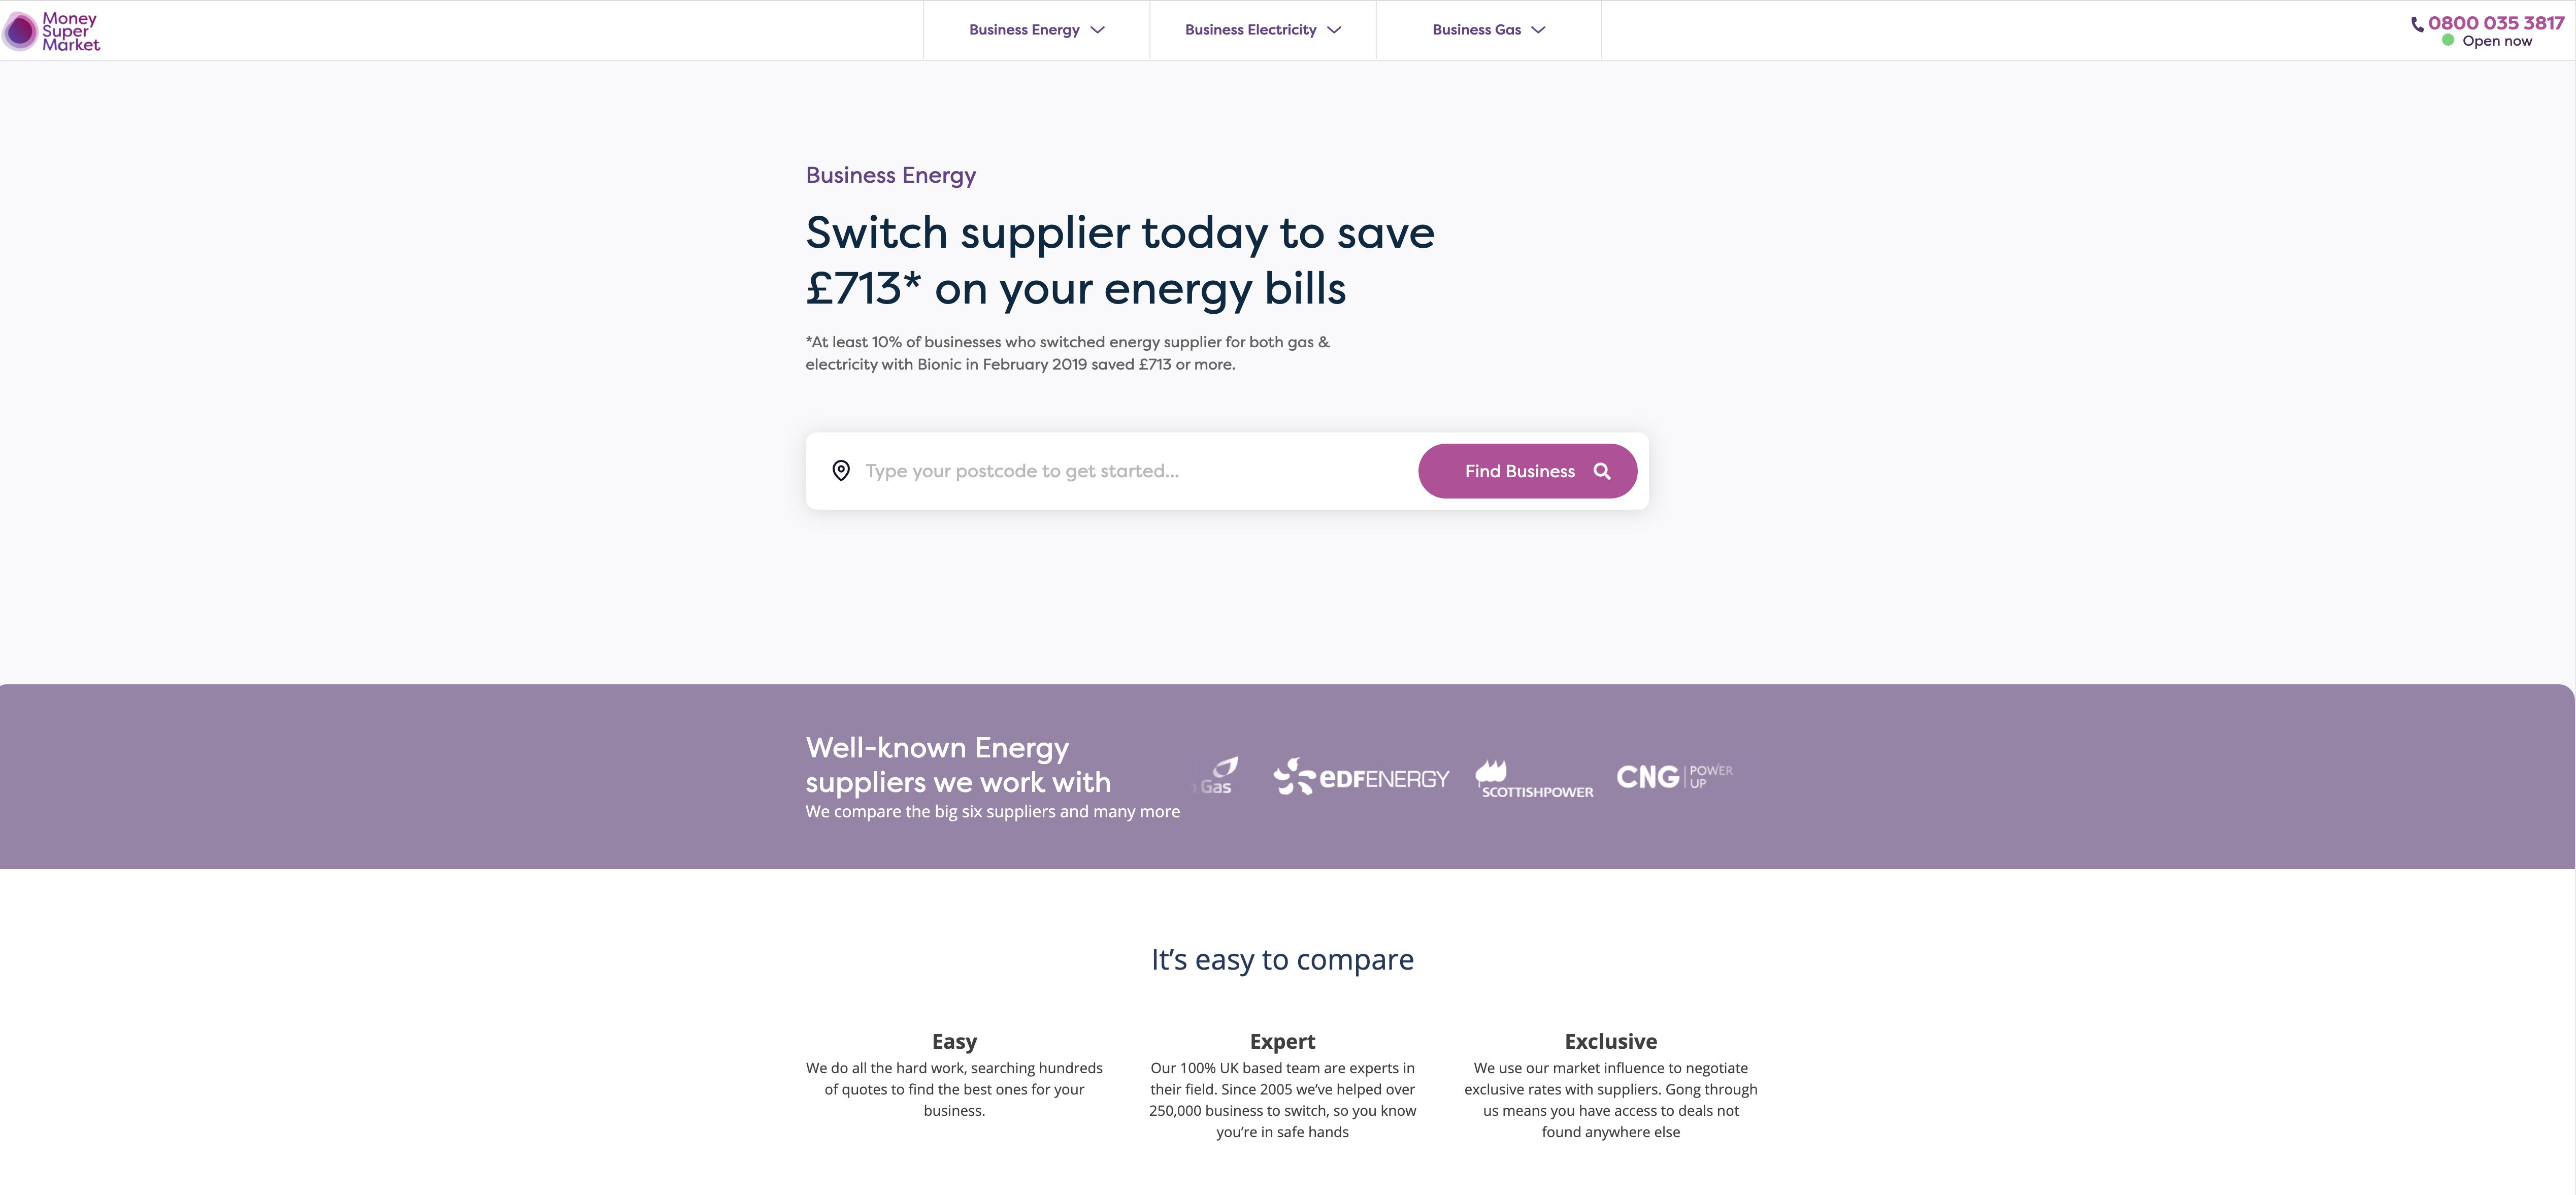 moneysupermarket business energy comparison site